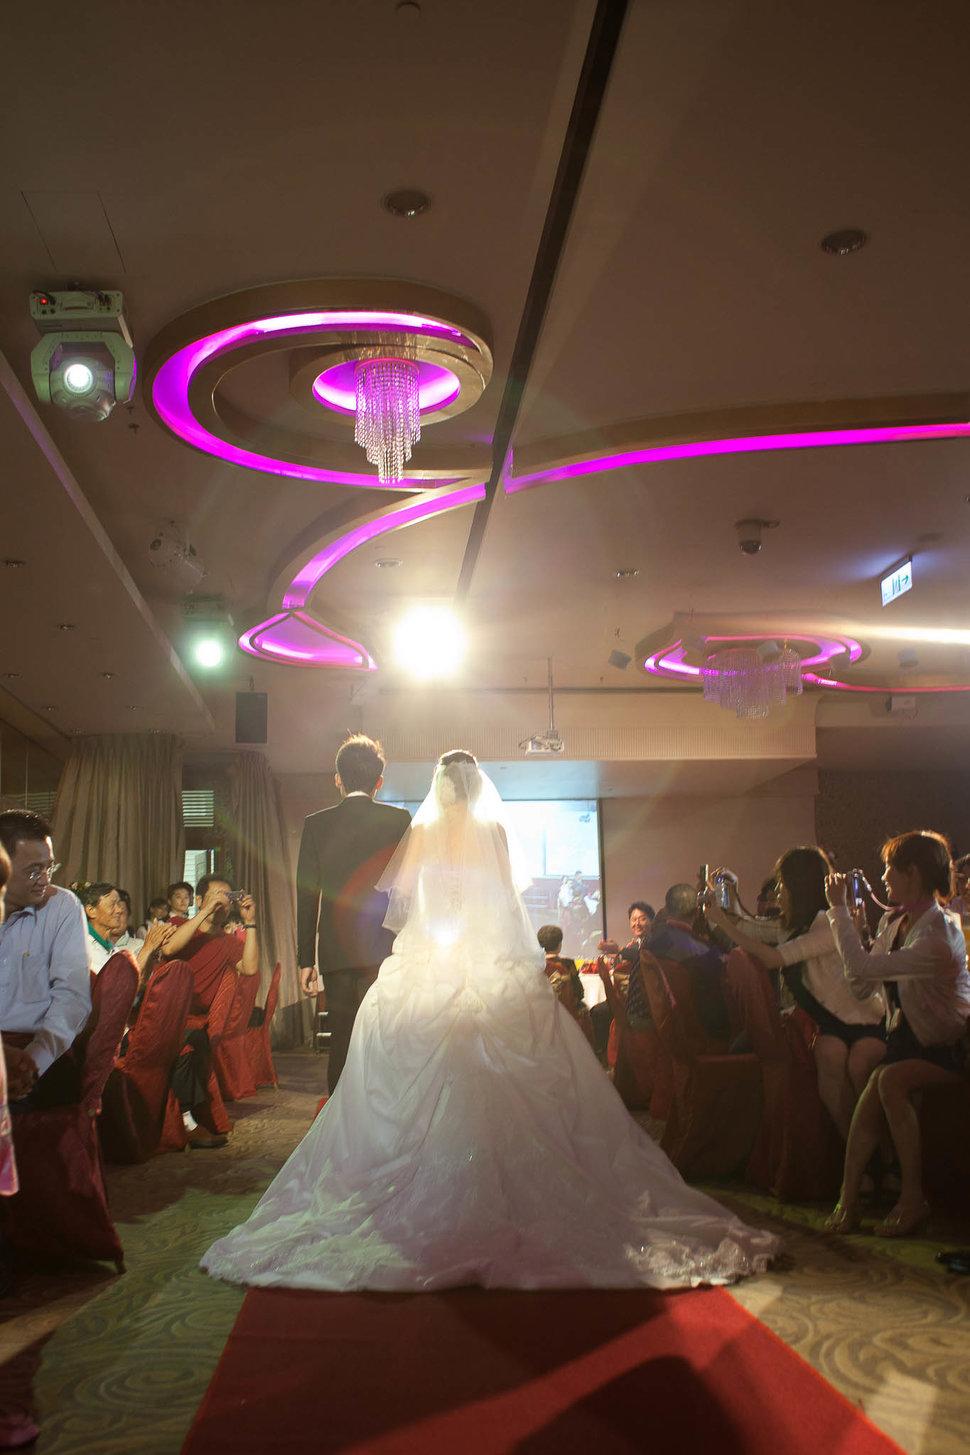 18PHOTO-敔帆❤️ 卿瑜(編號:242278) - 18PHOTO 婚紗影像攝影工作室 - 結婚吧